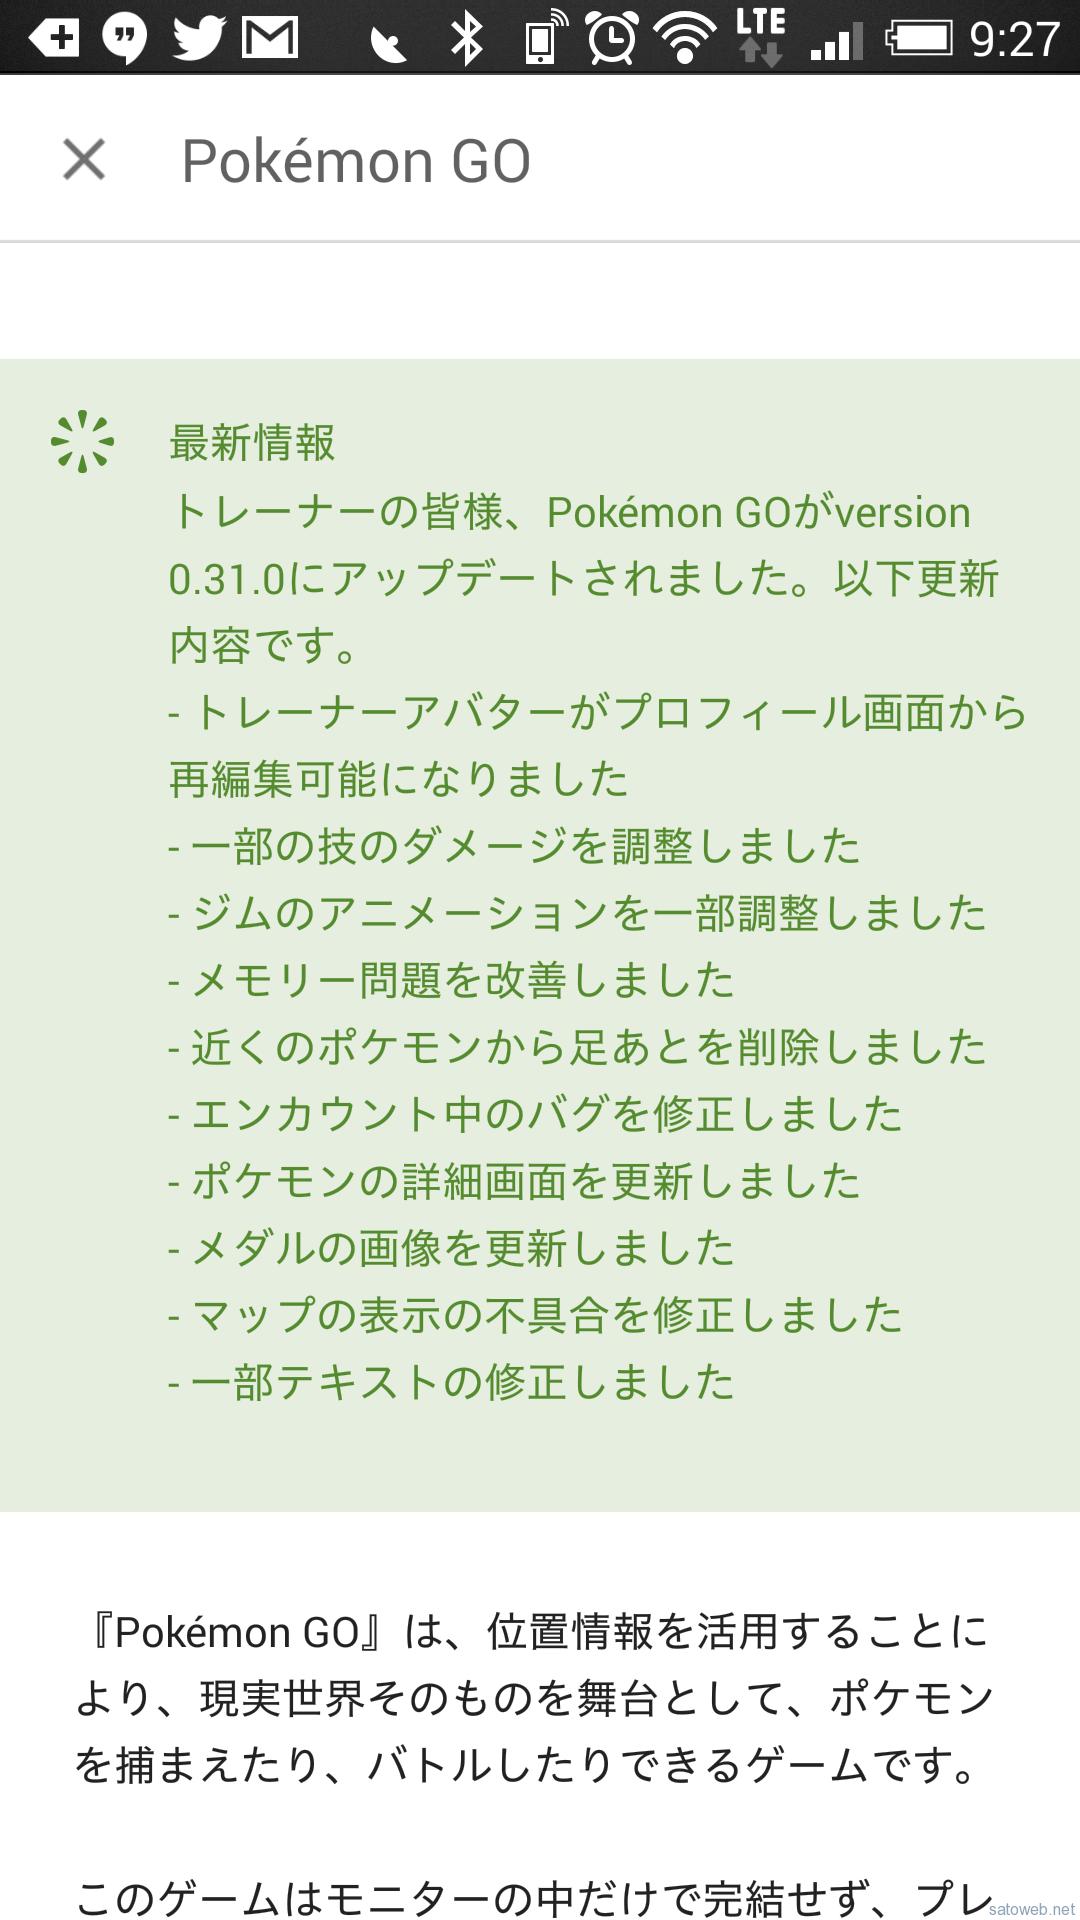 PokémonGoが 0.31.0にアップデート。アバター変更機能ほか道路が復活!